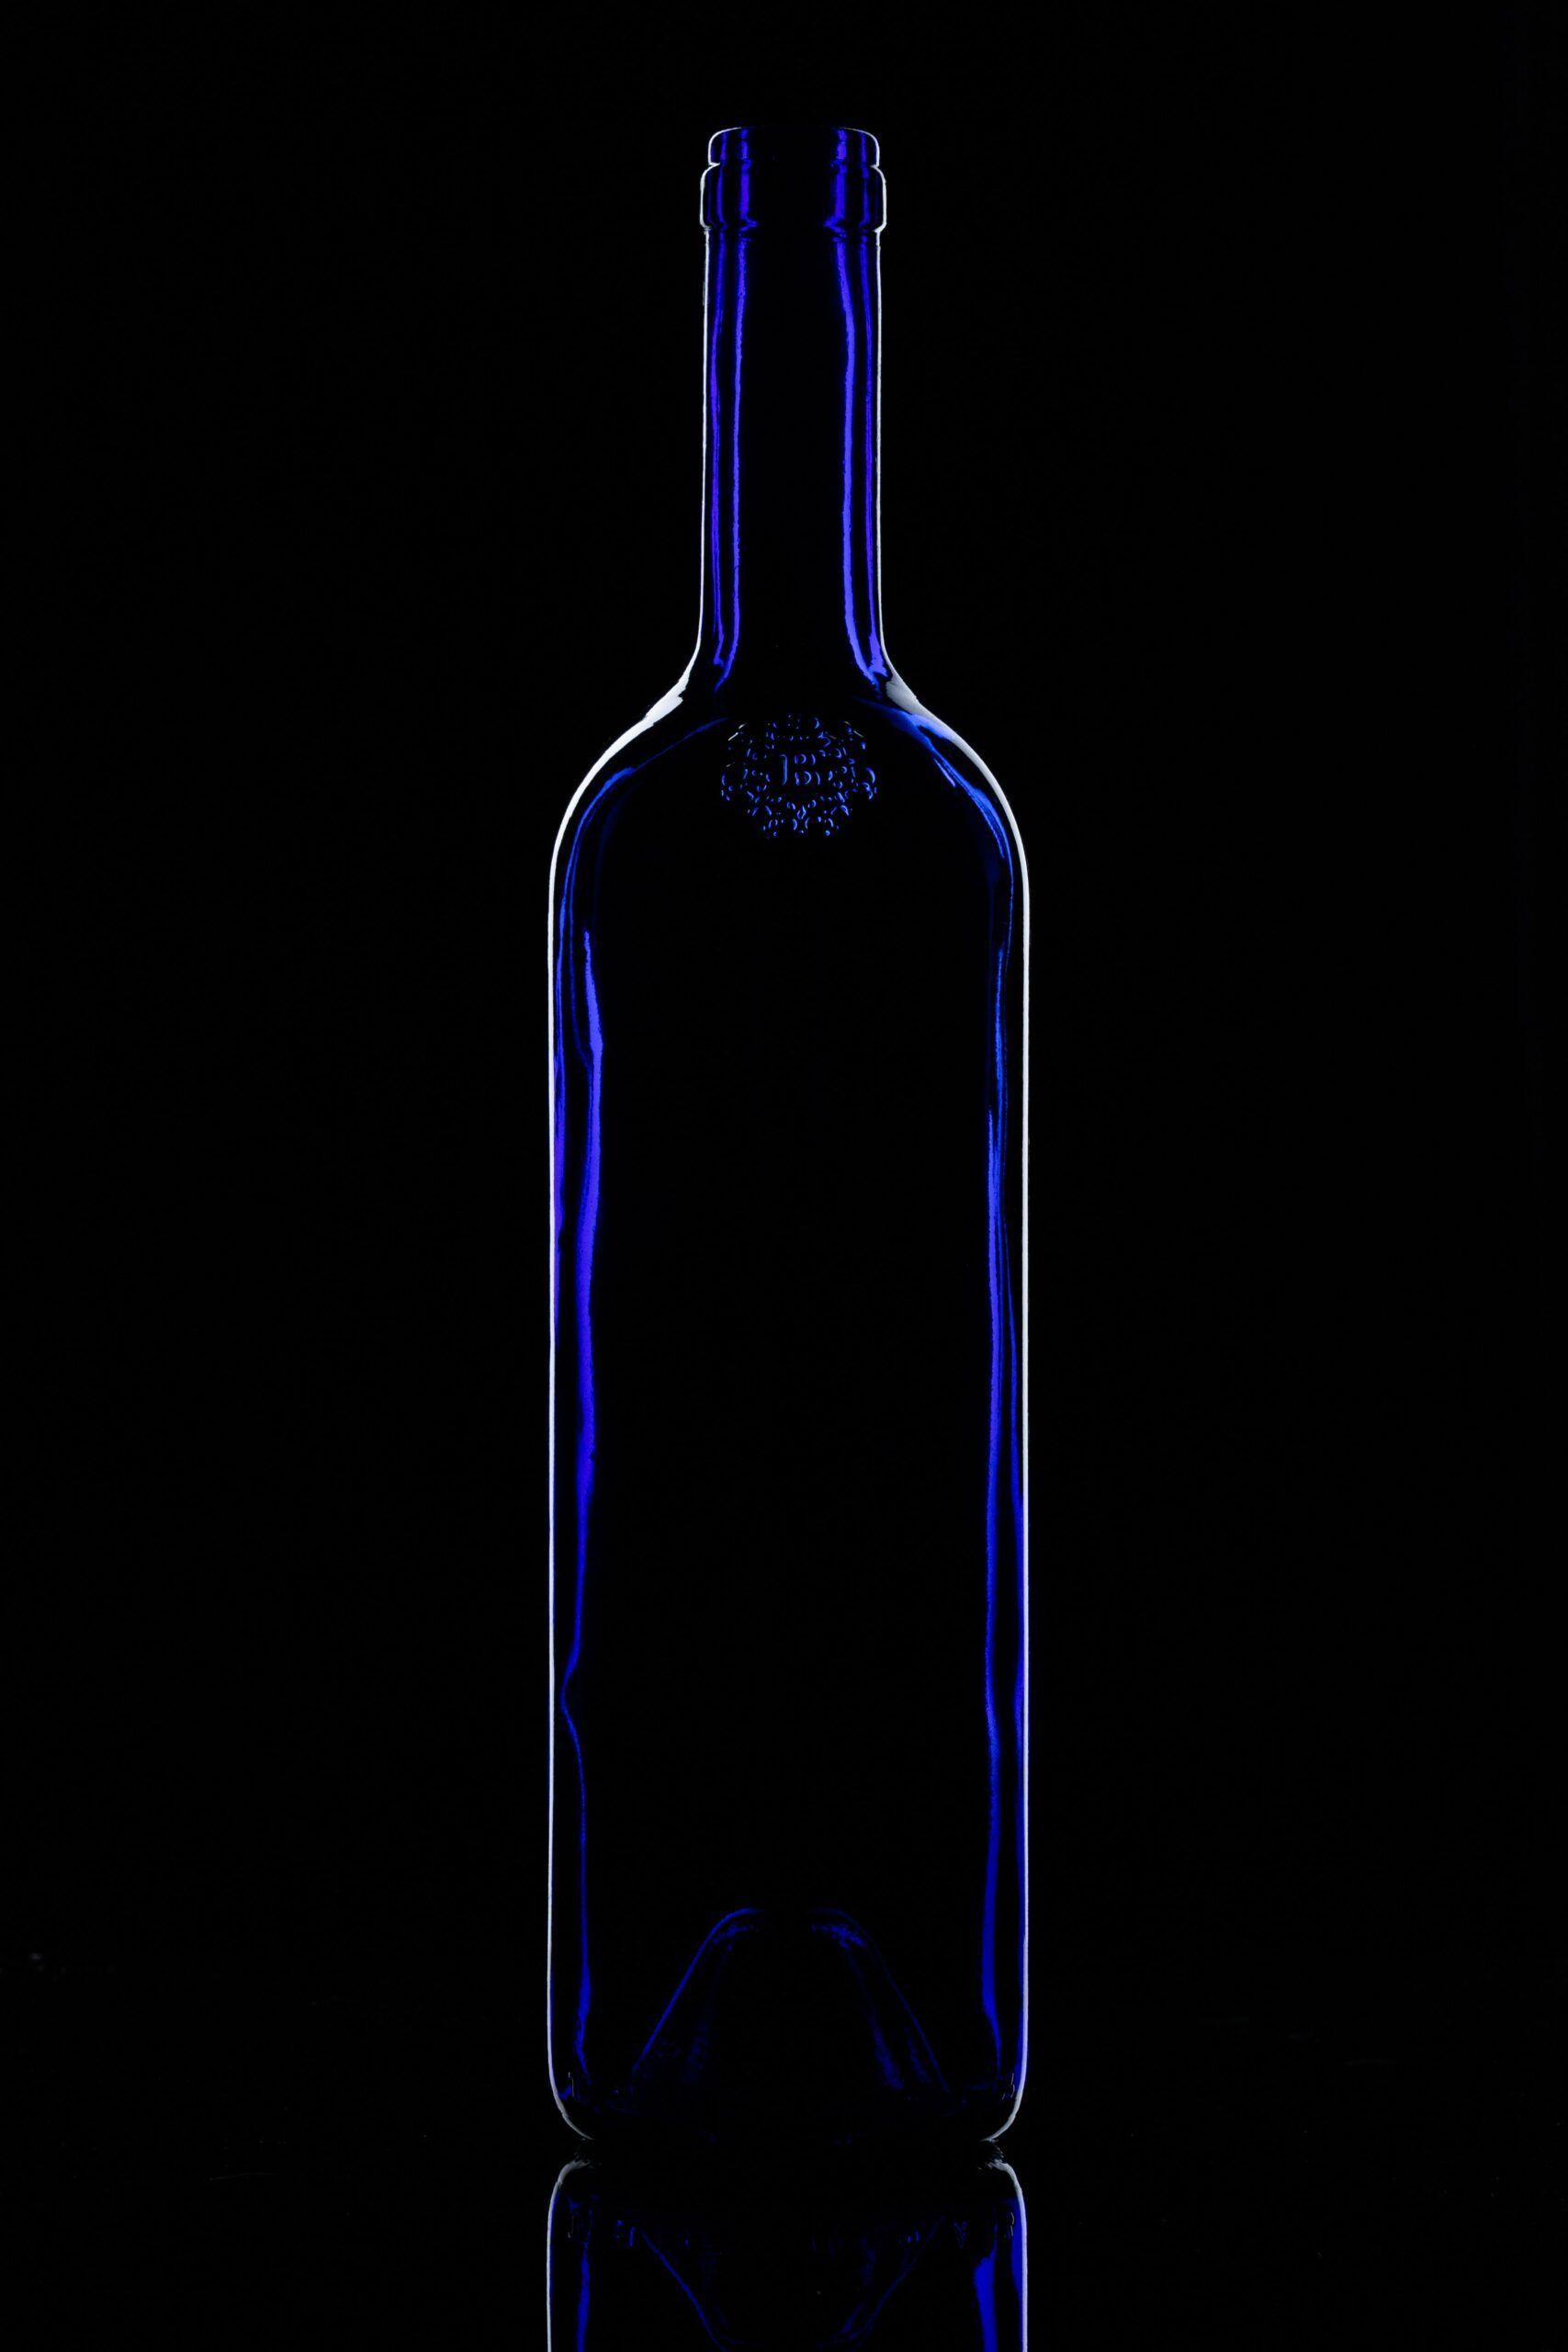 como conservar botellas de vino abiertas